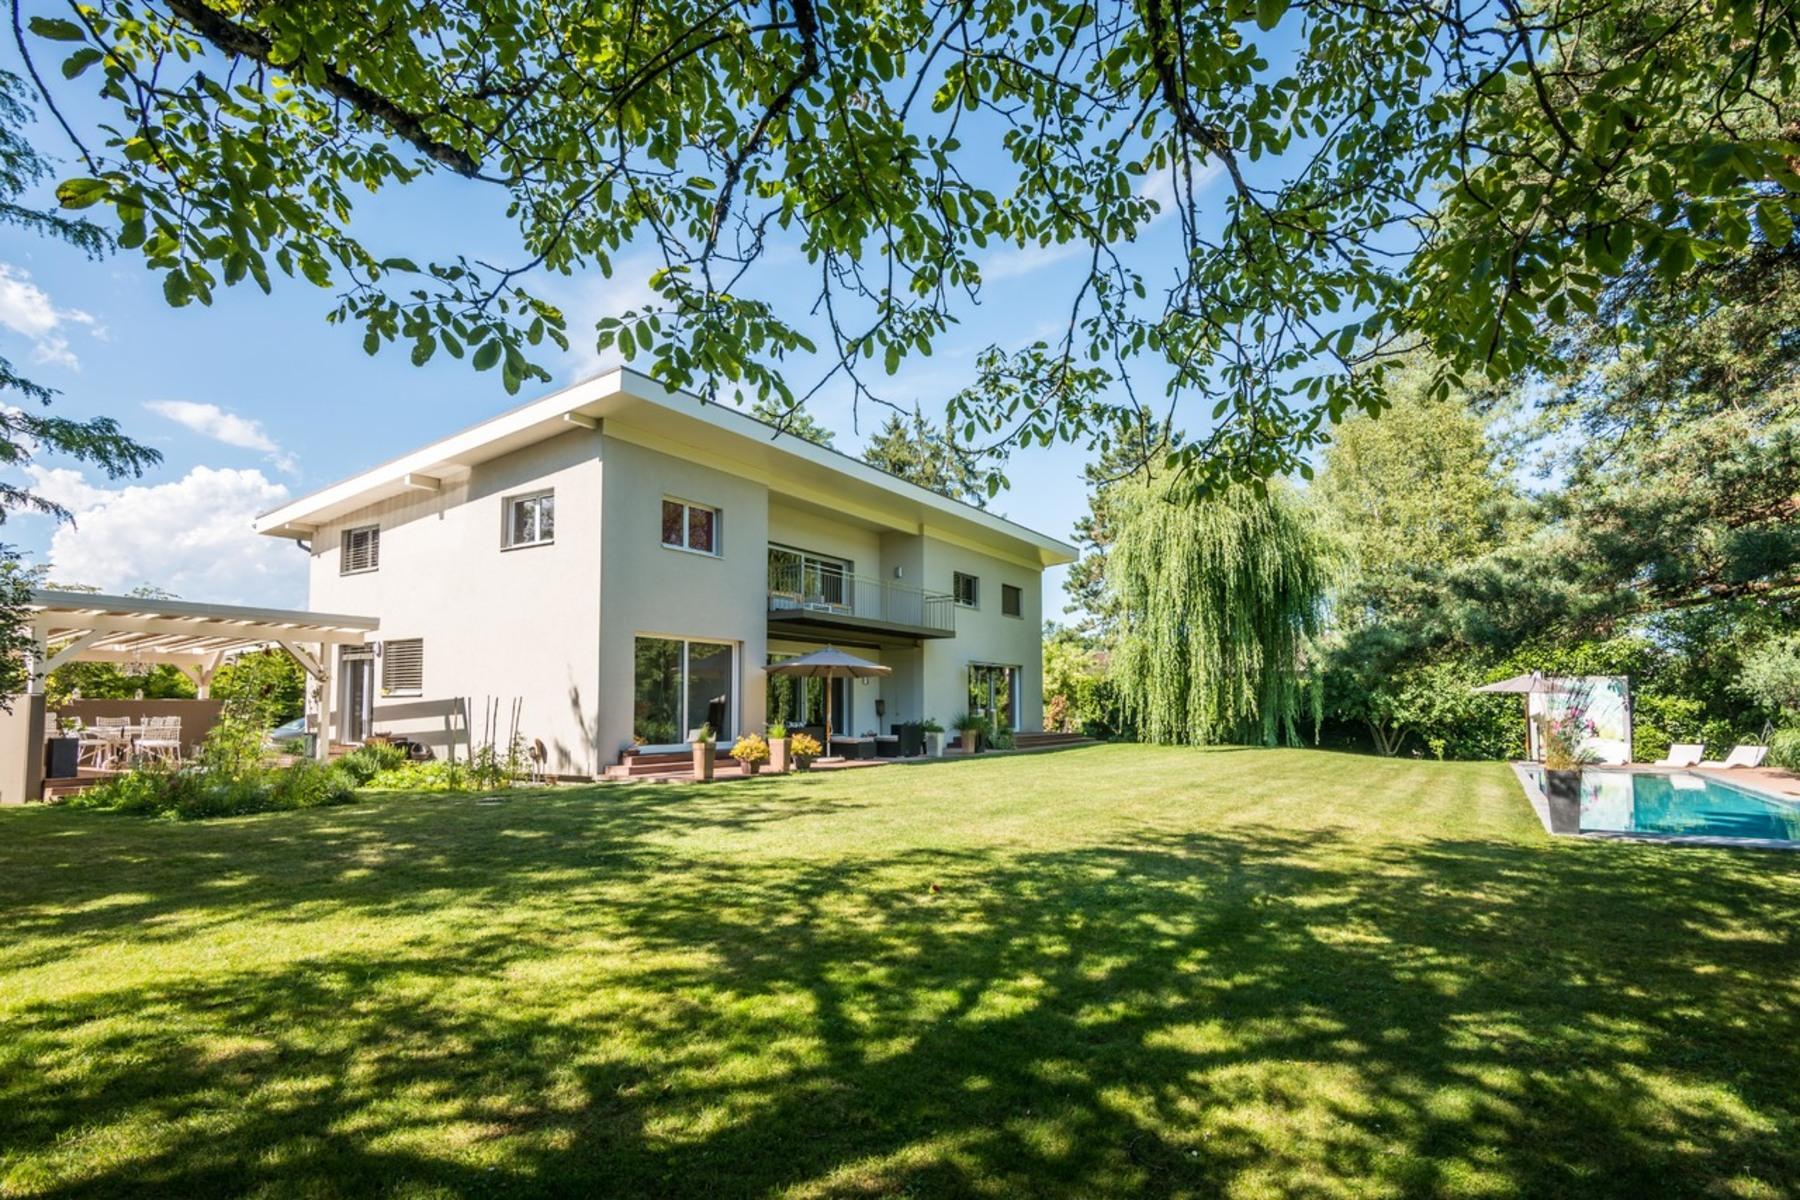 Single Family Home for Sale at Detached, spacious villa with plenty of natural light Vandoeuvres Vandoeuvres, Geneva 1253 Switzerland